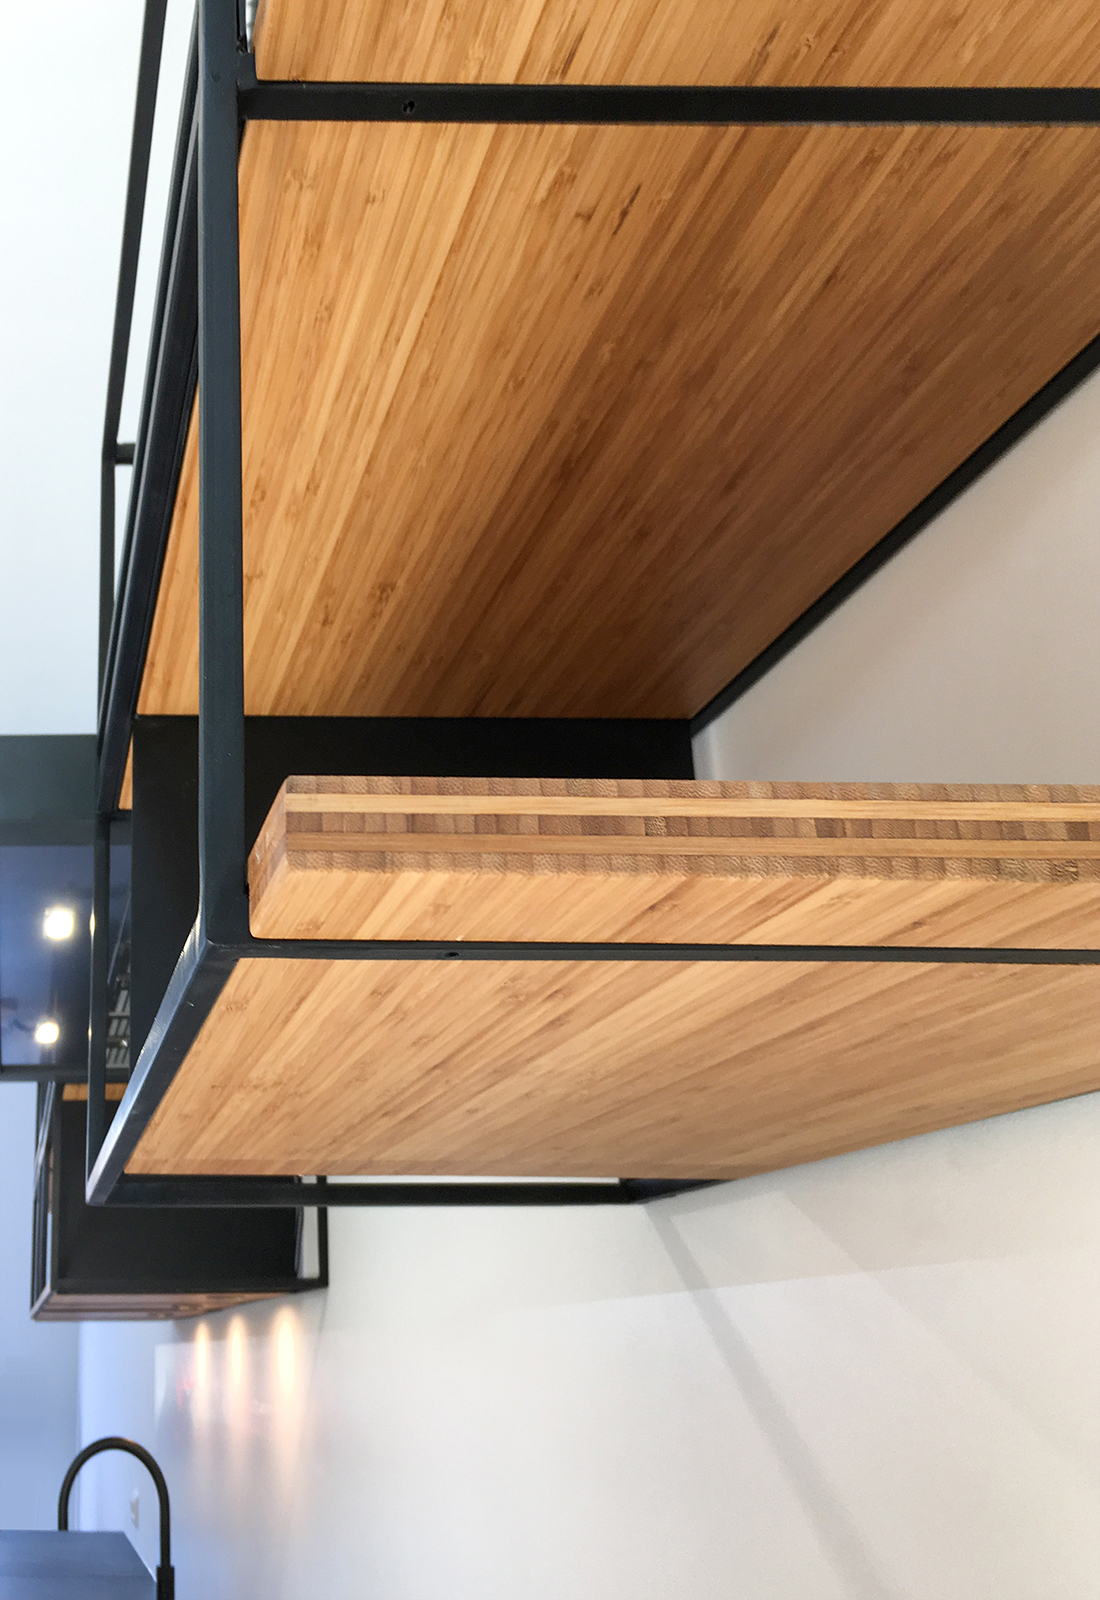 Keuken van bamboe en staal